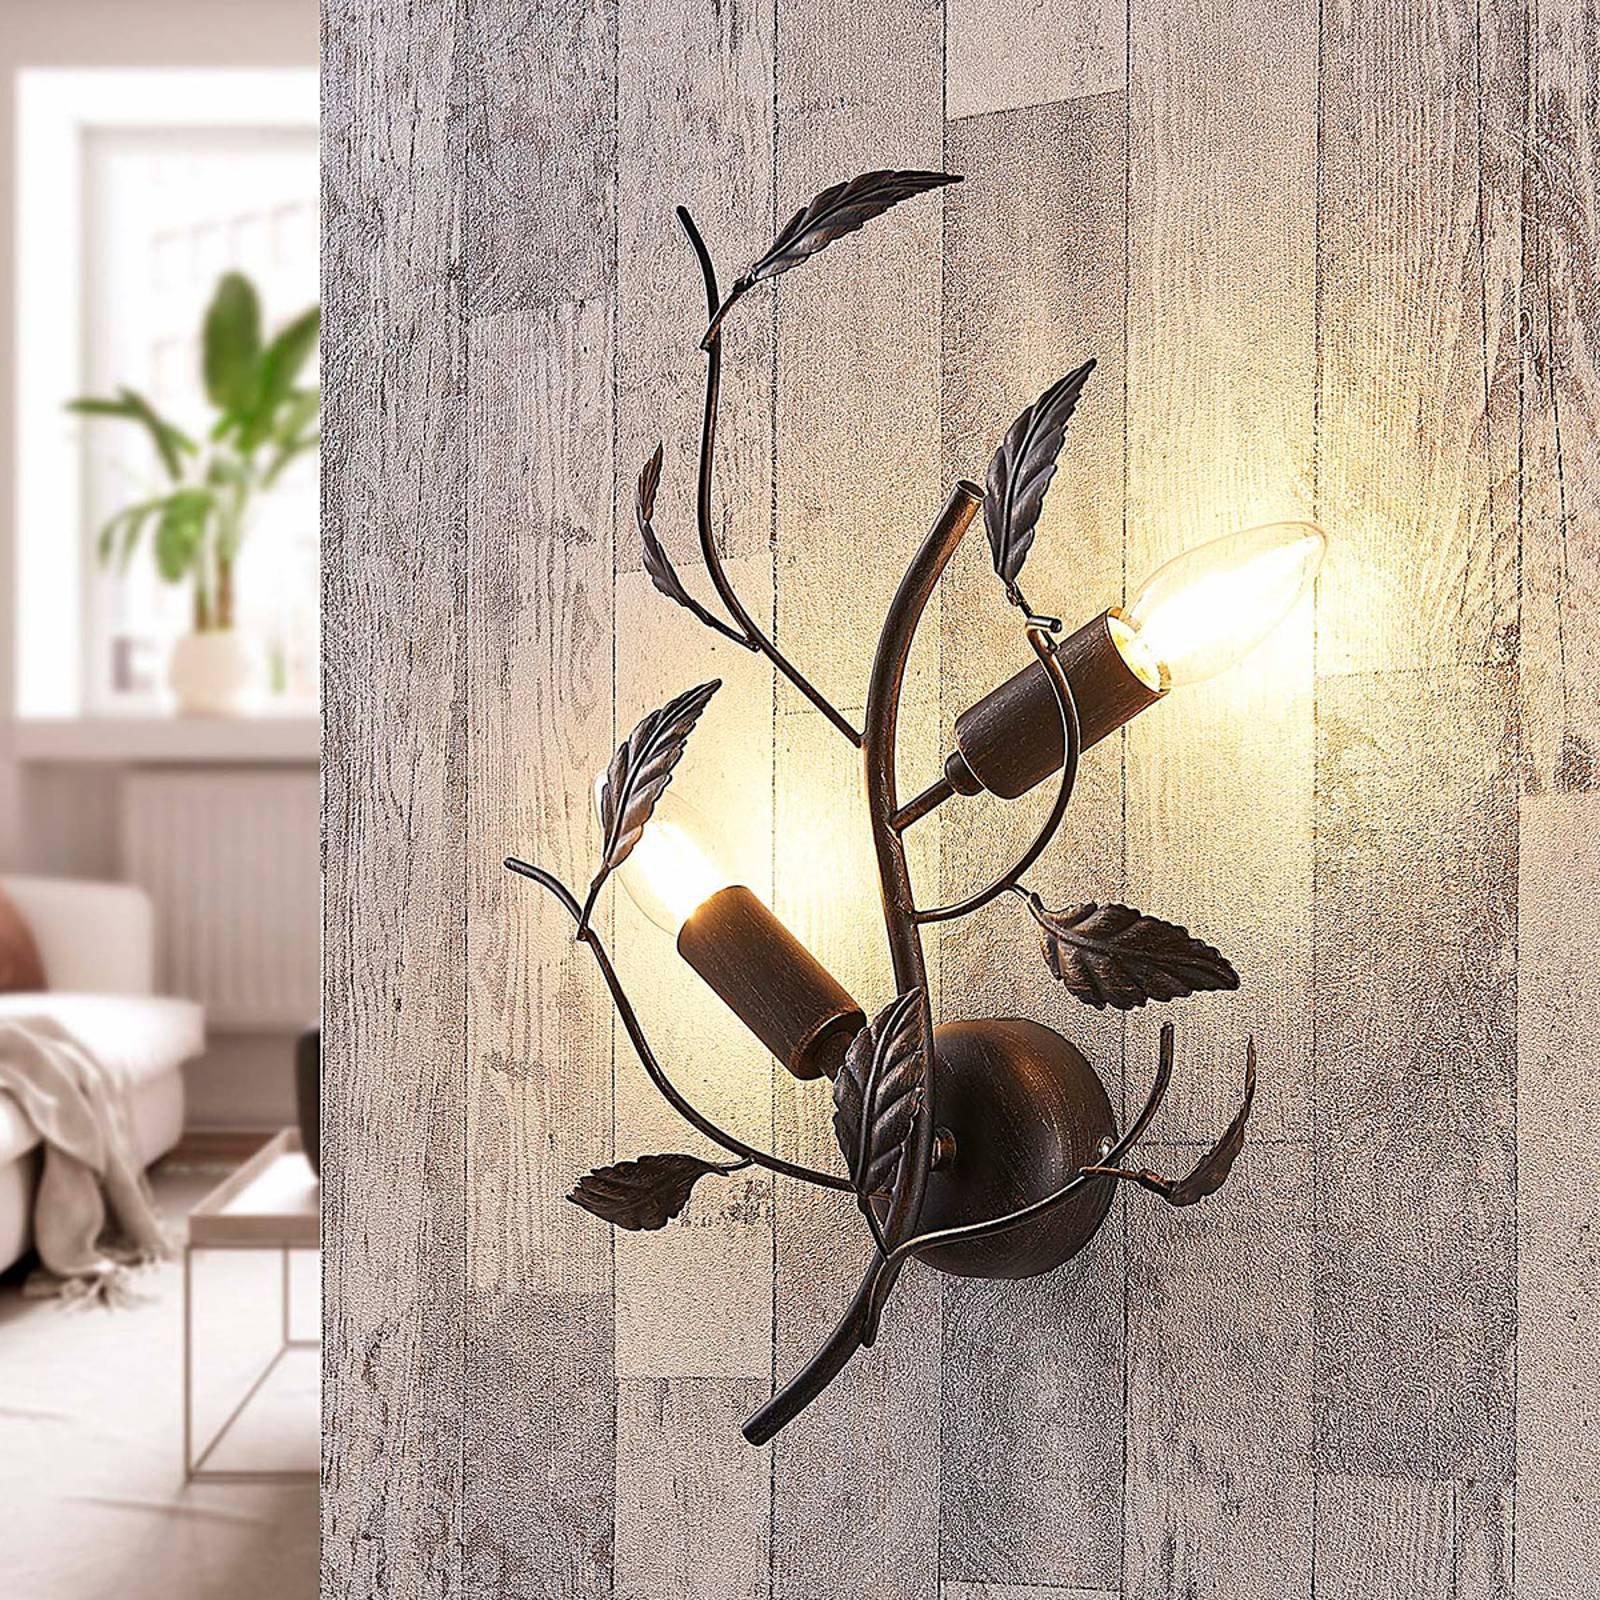 Vegglampe Yos i metall med bladdekor